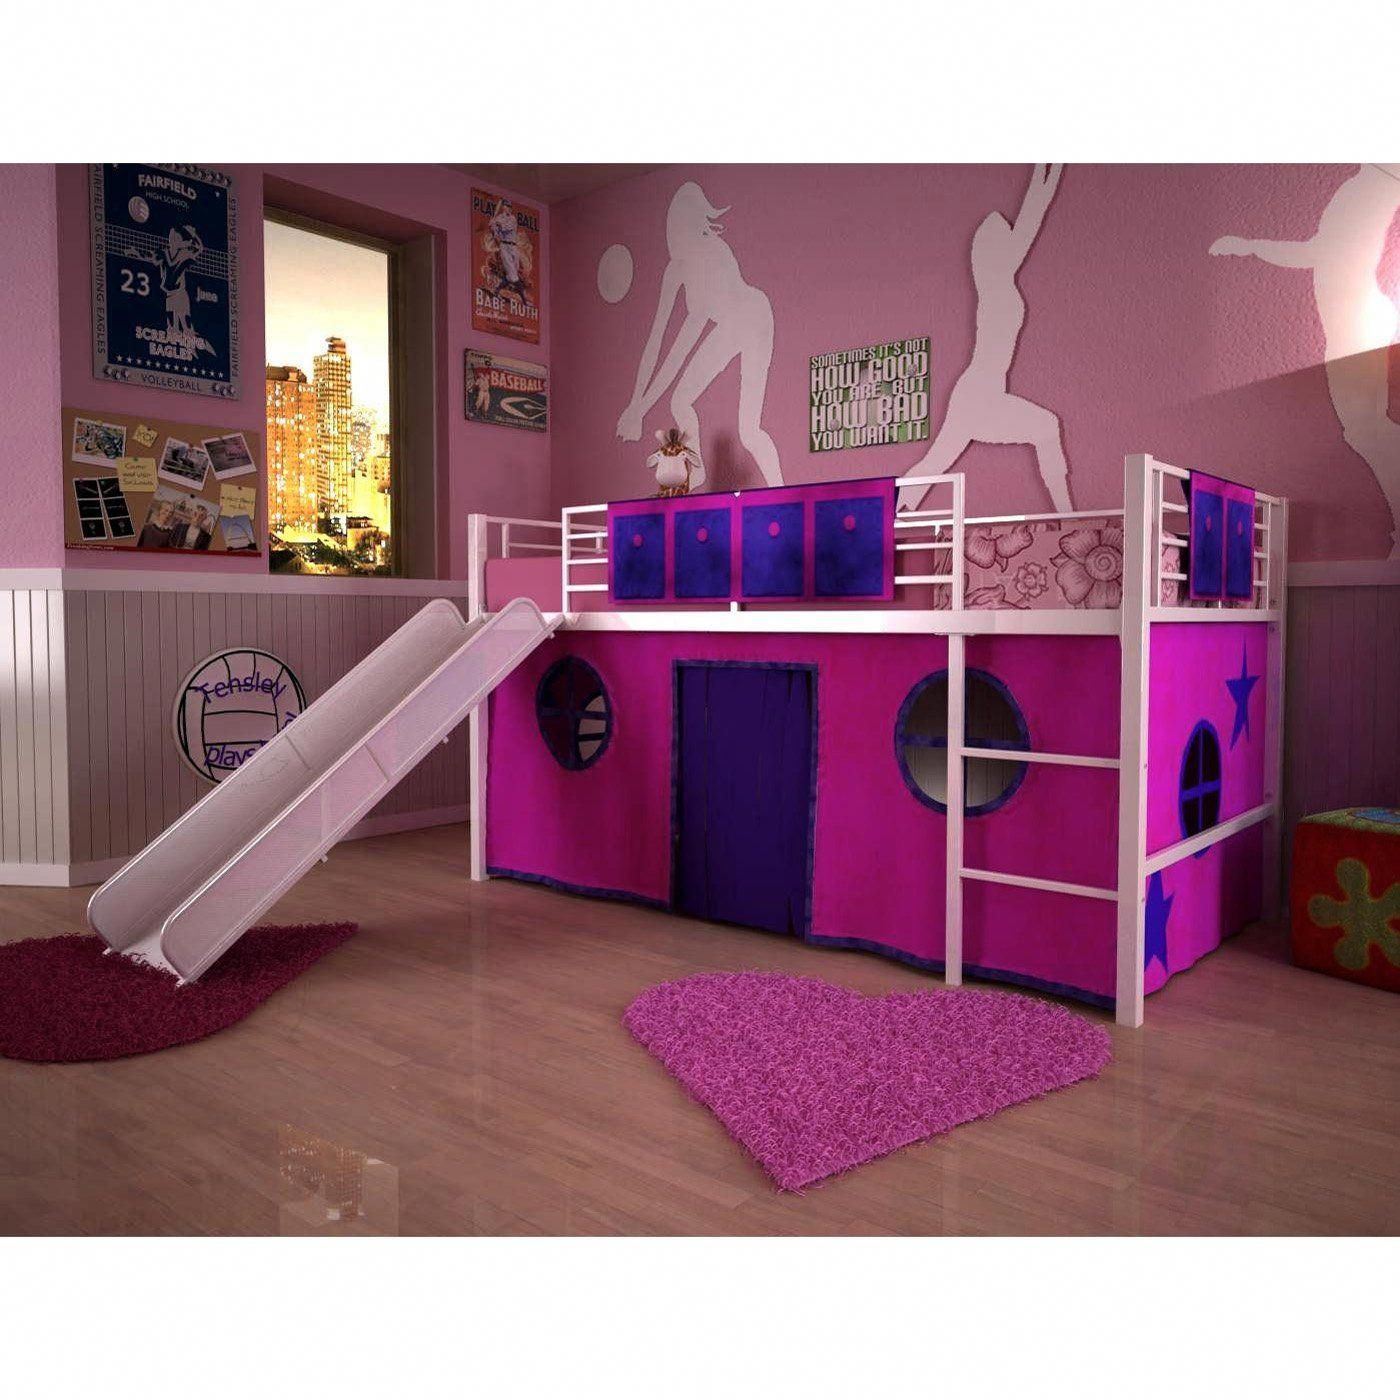 Loft bedroom ideas for teenage girls  pinkloftbedsforteenagersloftbedsforteenagegirlspbteen